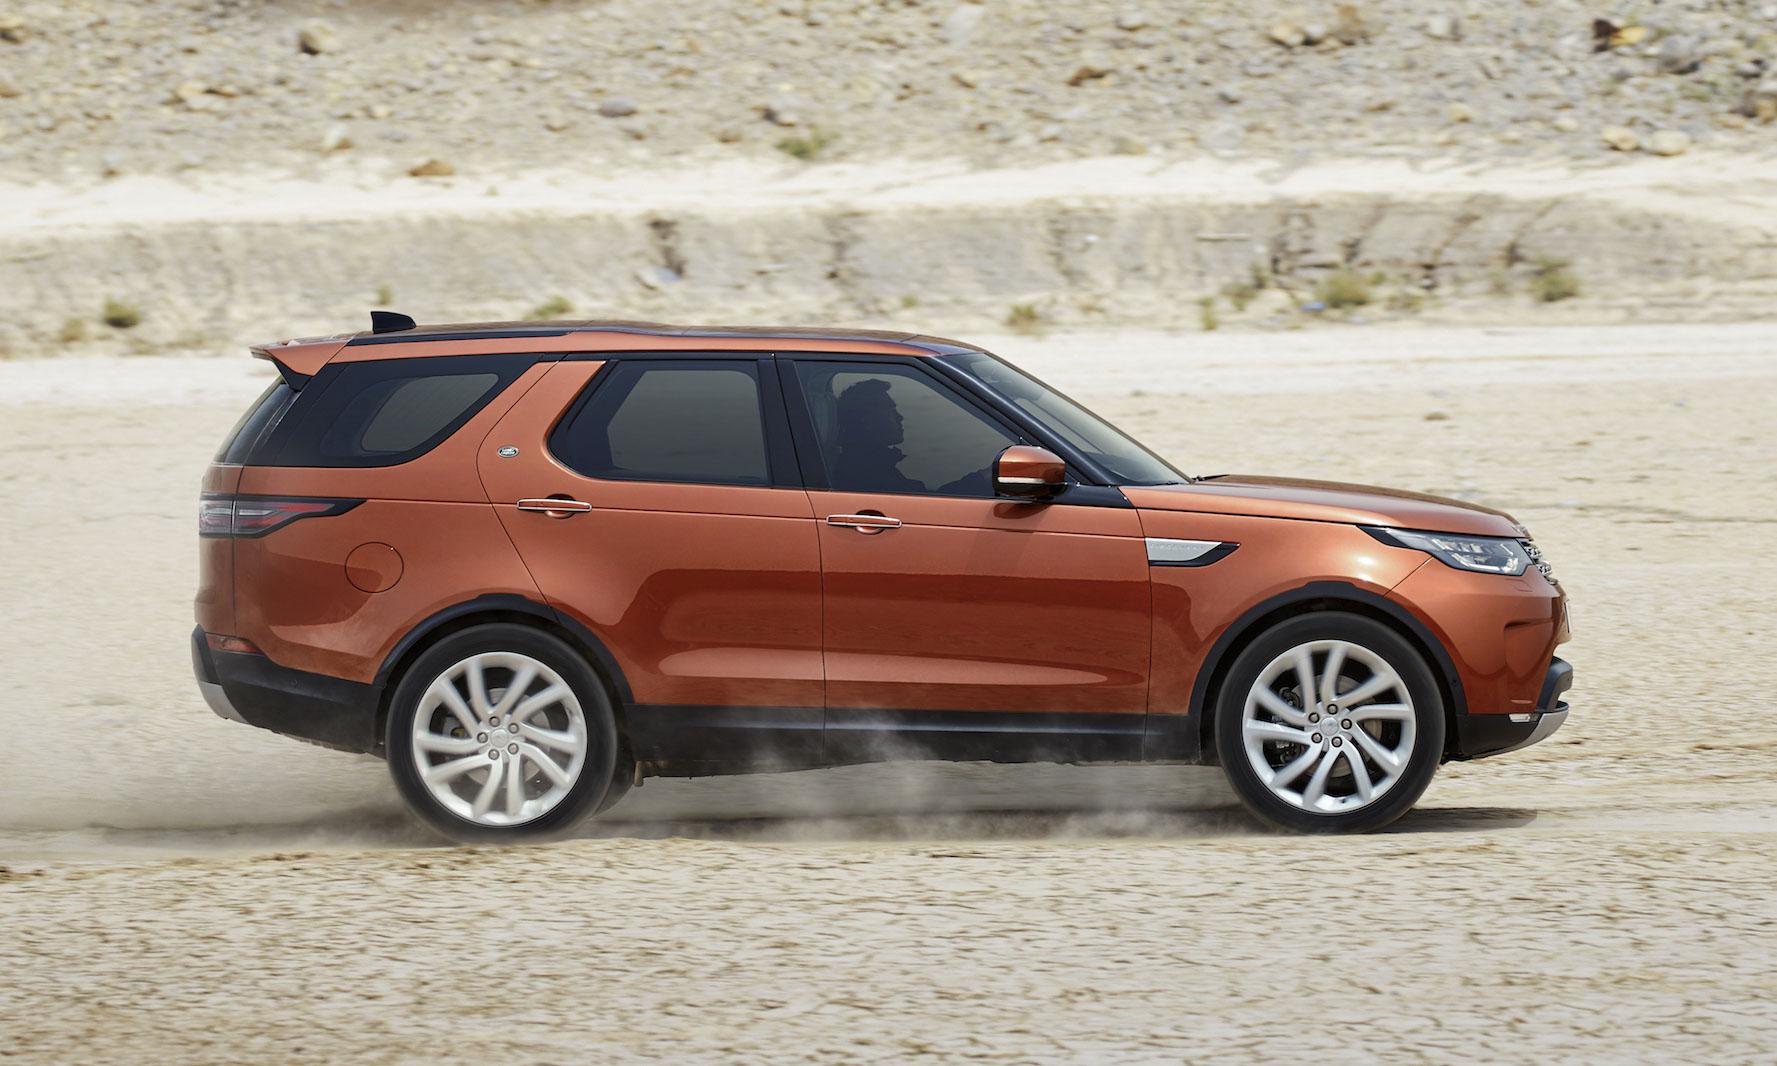 © Jaguar Land Rover North America